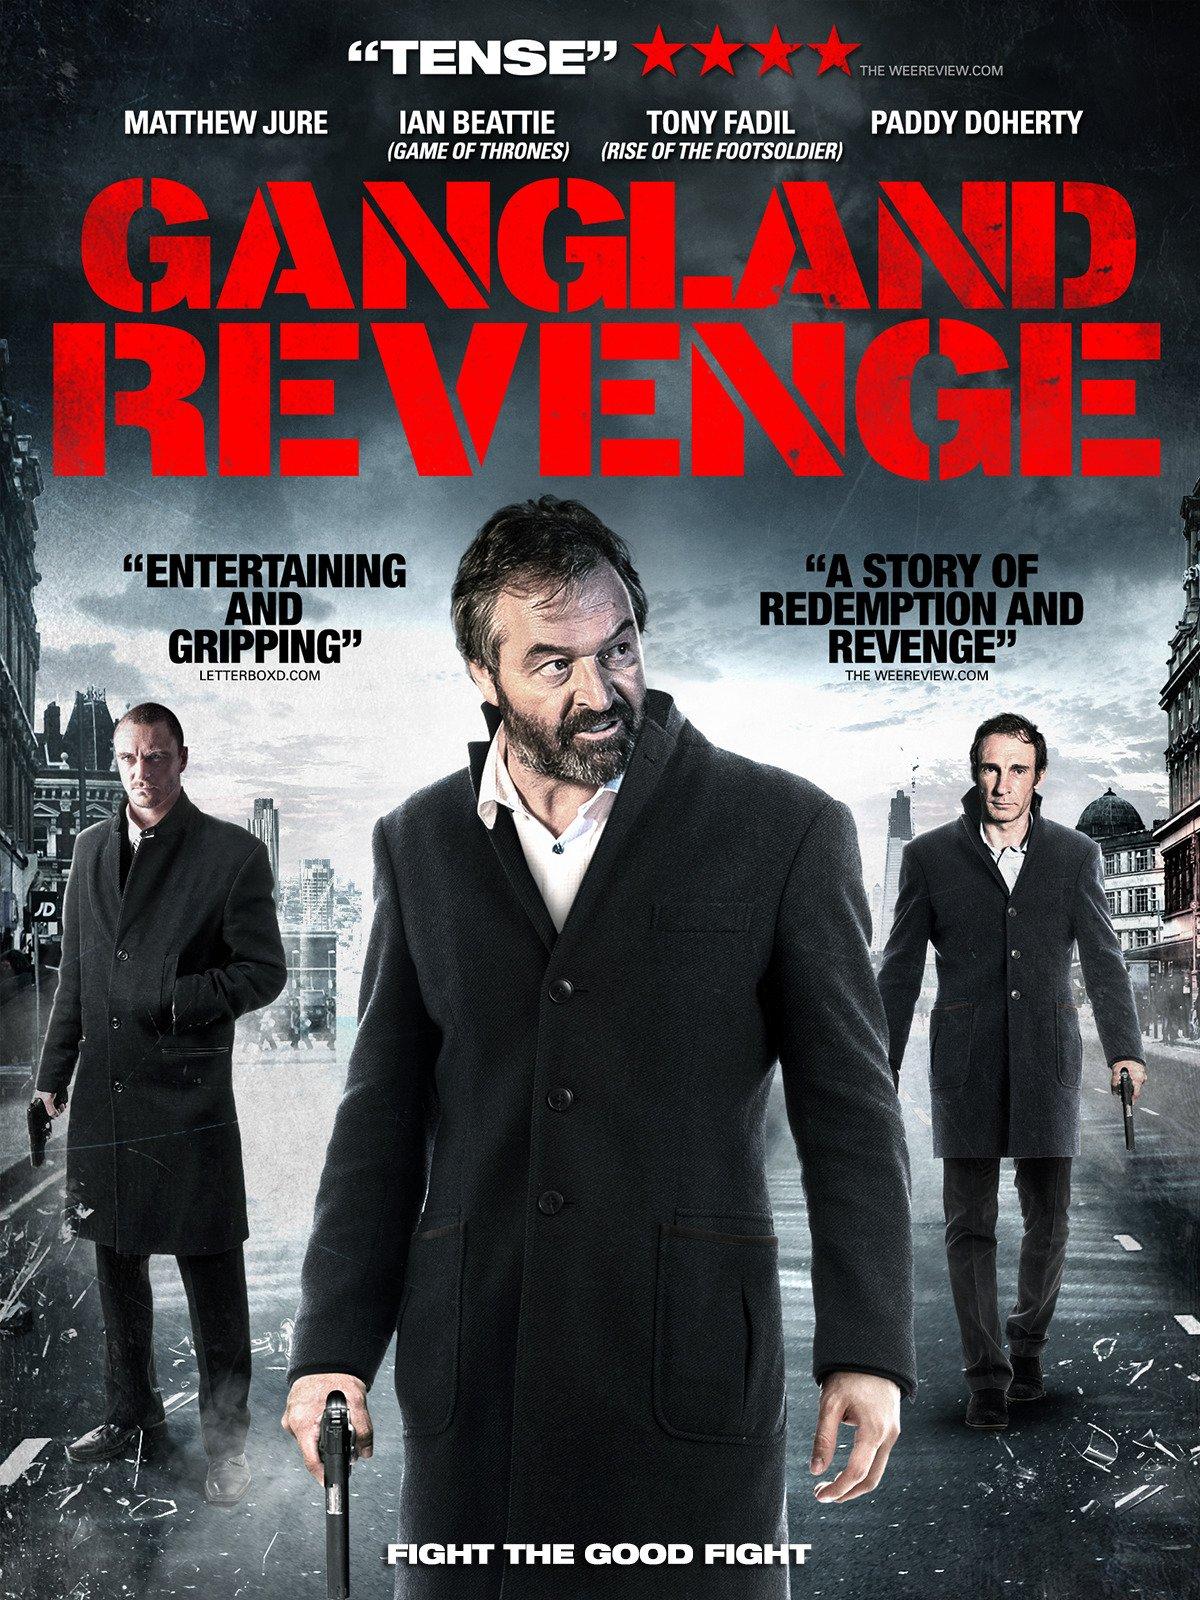 Gangland Revenge